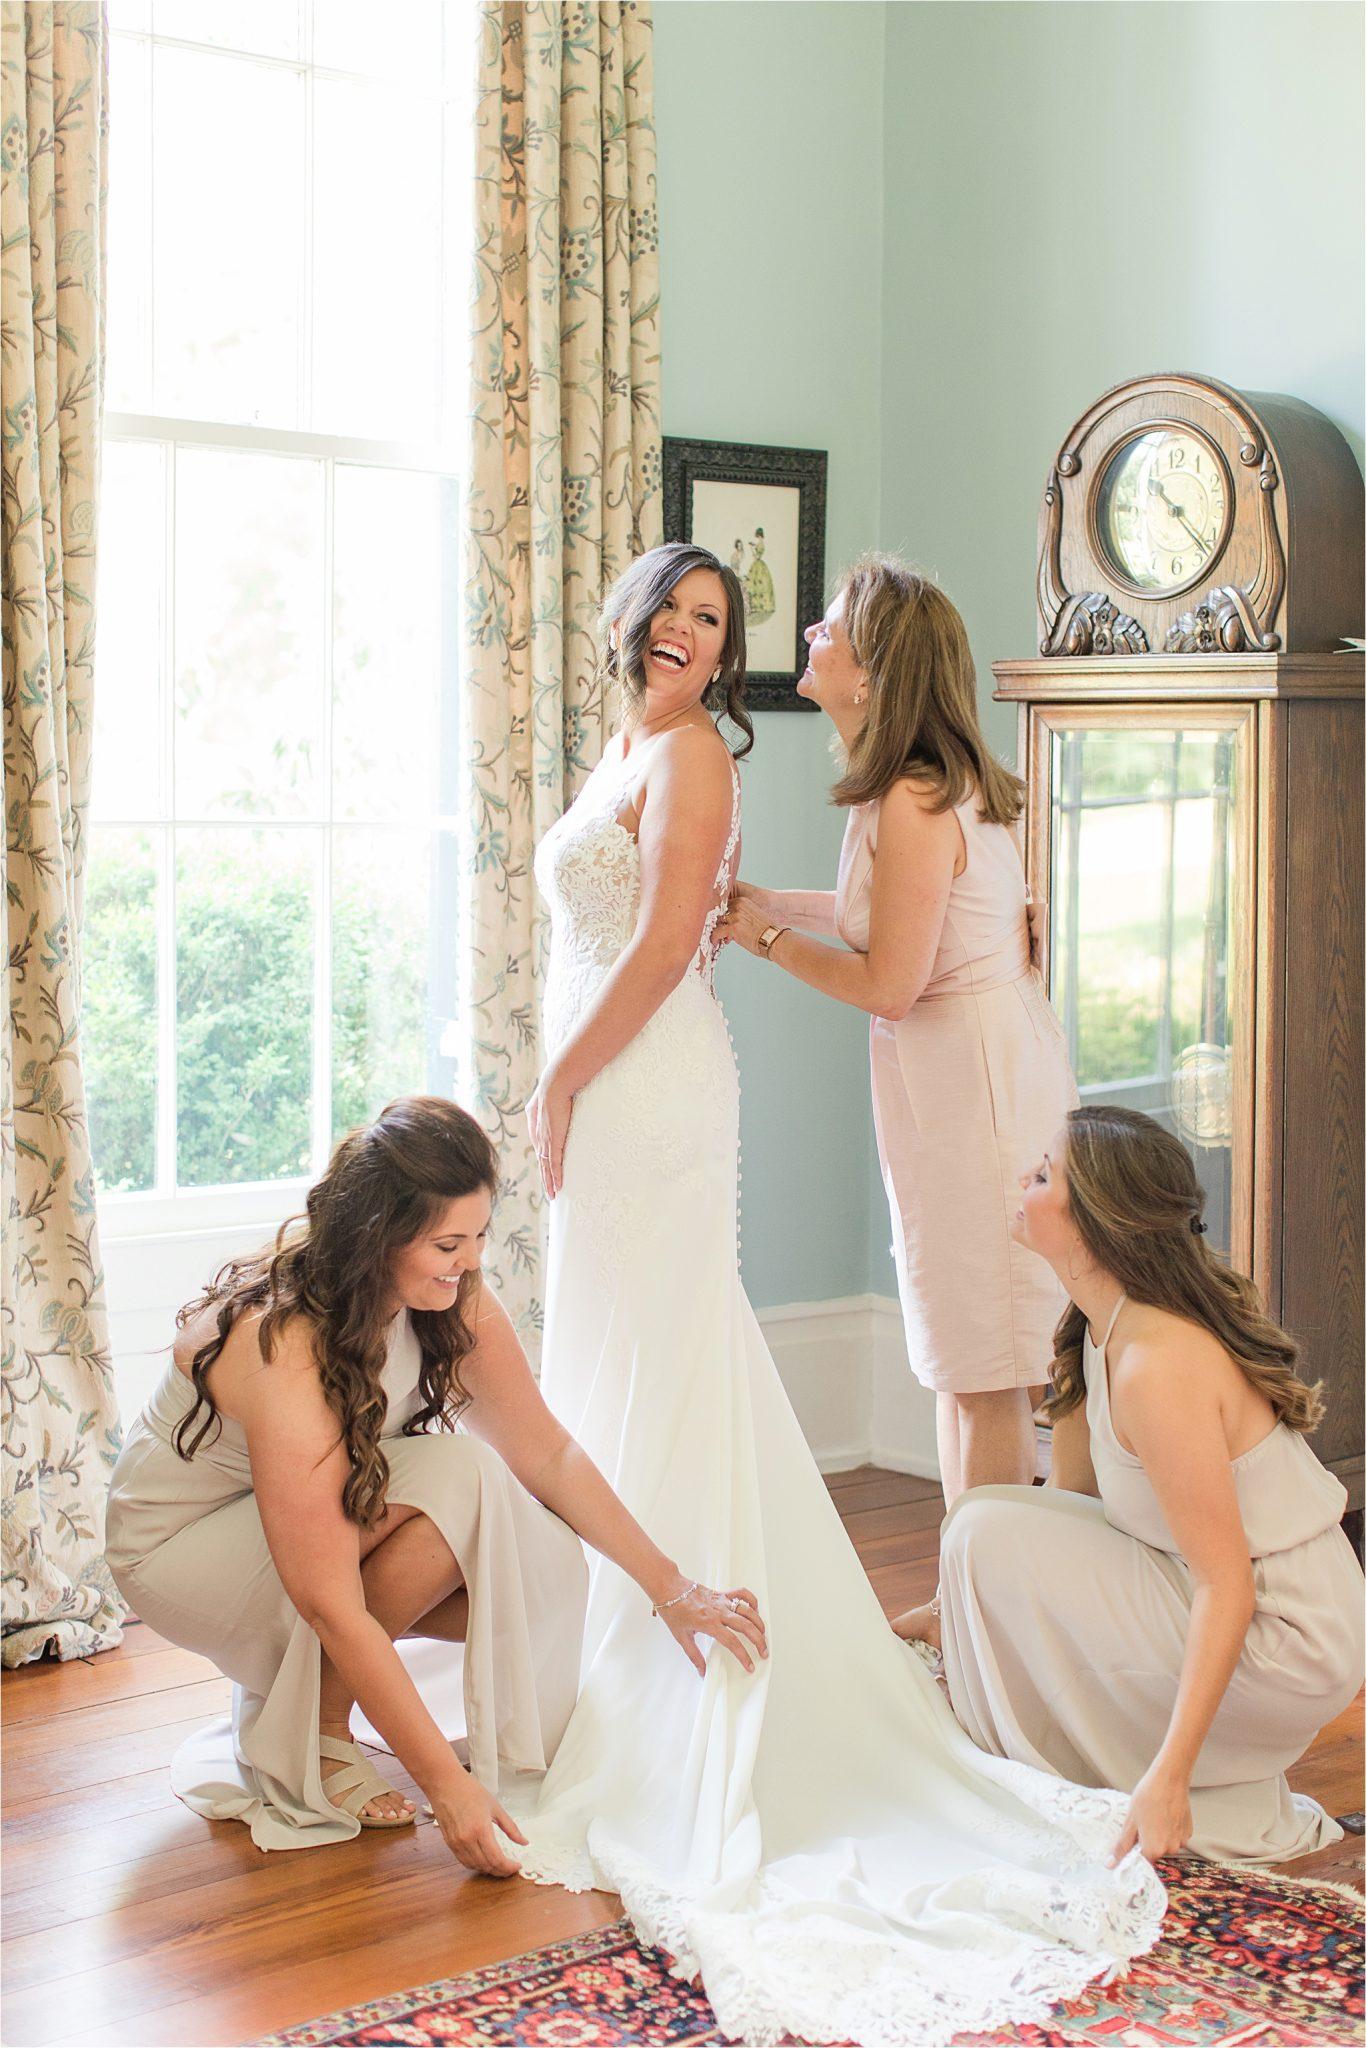 Hedge Farm Wedding | Alabama Wedding Photographer | Barn Wedding | Brides and bridesmaids